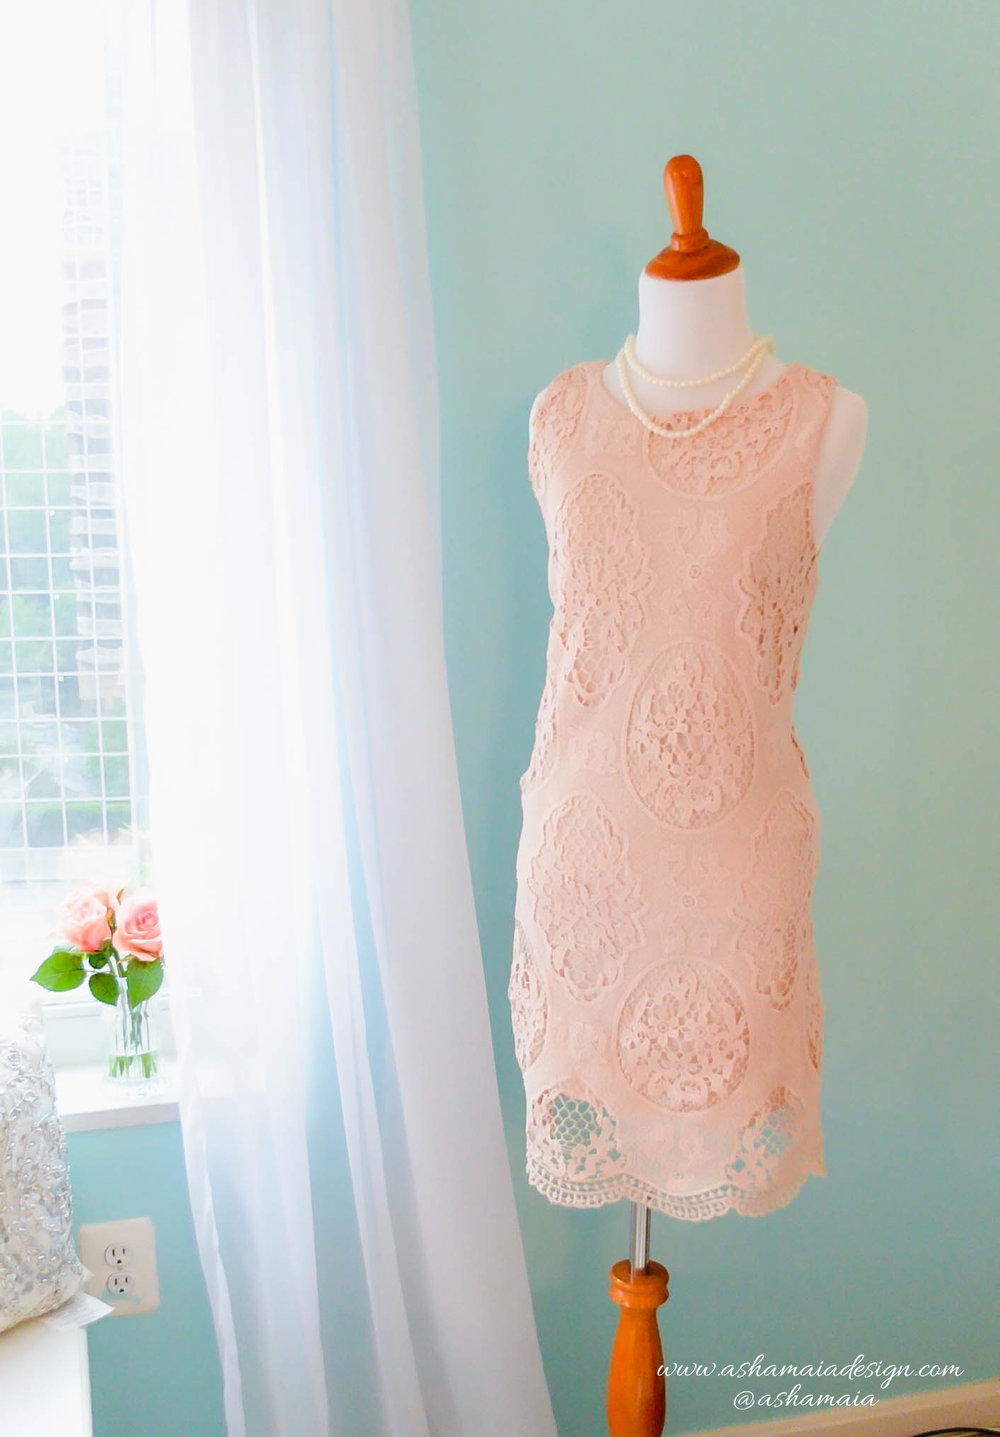 Bridal Shower Brunch-9.jpg